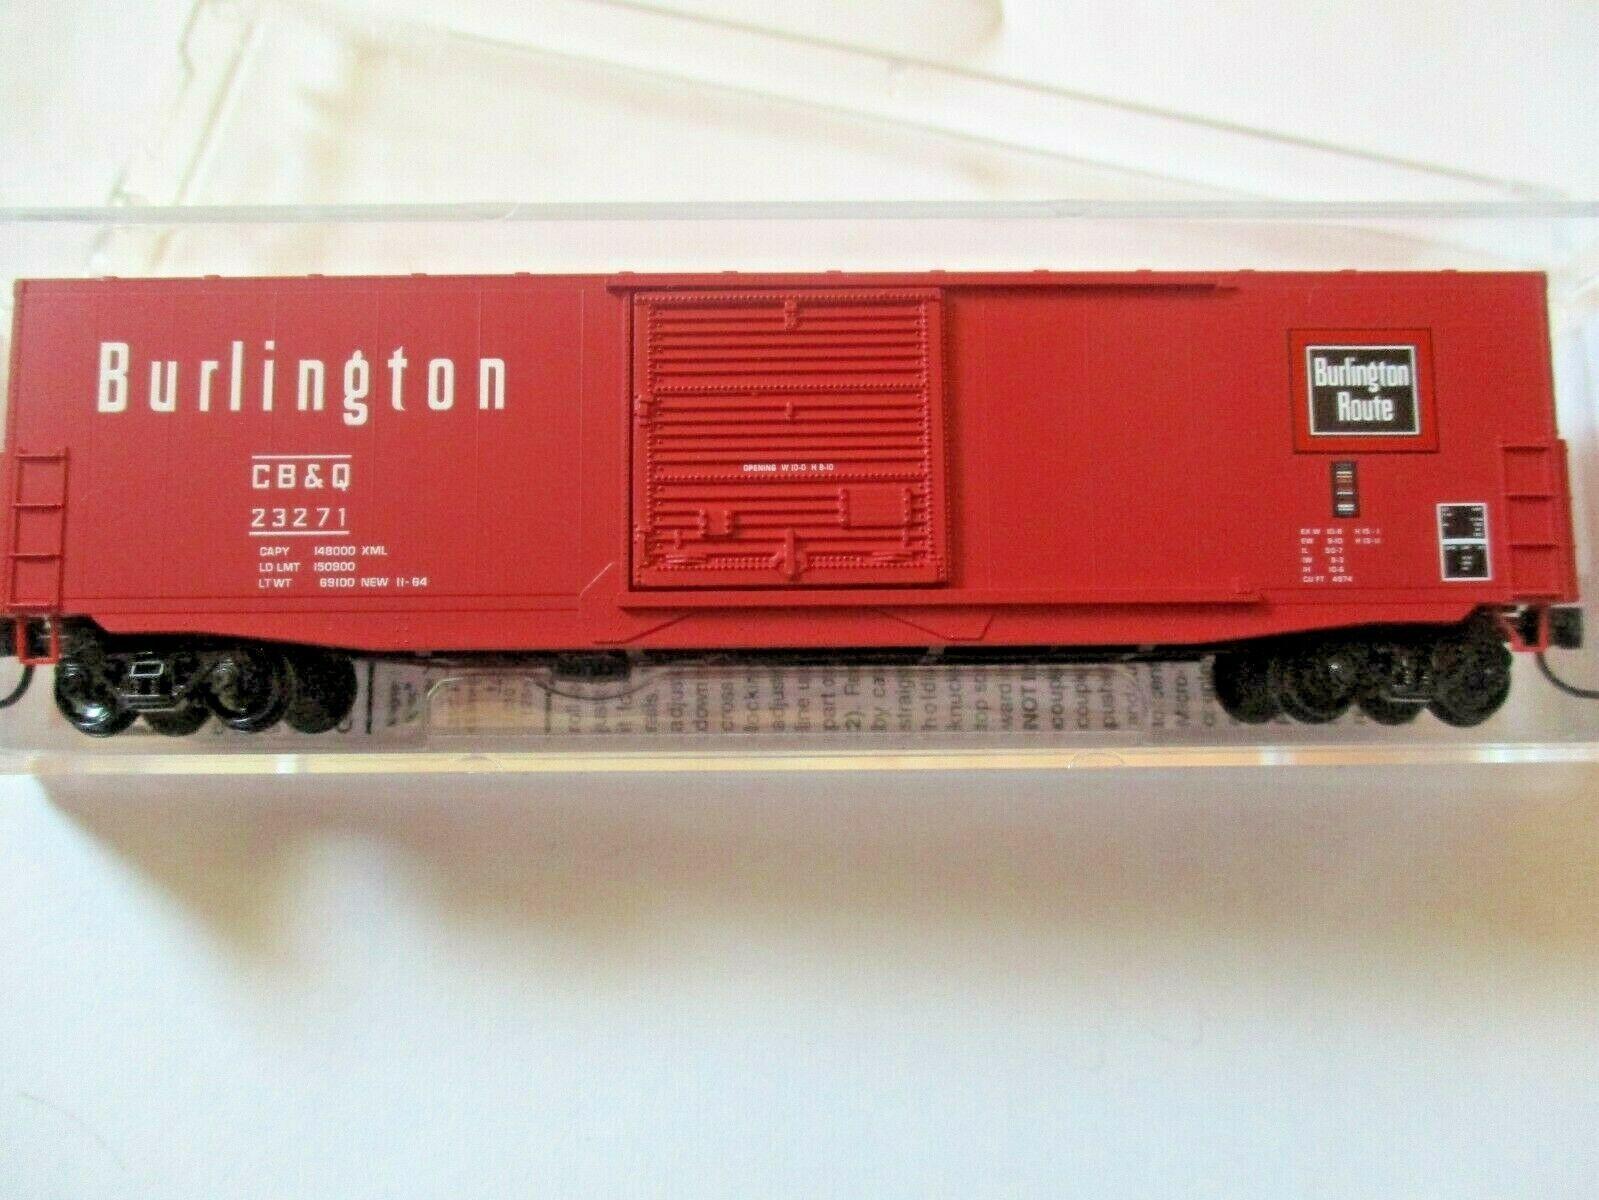 Micro-Trains # 18000210 Chicago Burlington & Quincy 50' Standard Boxcar N-Scale